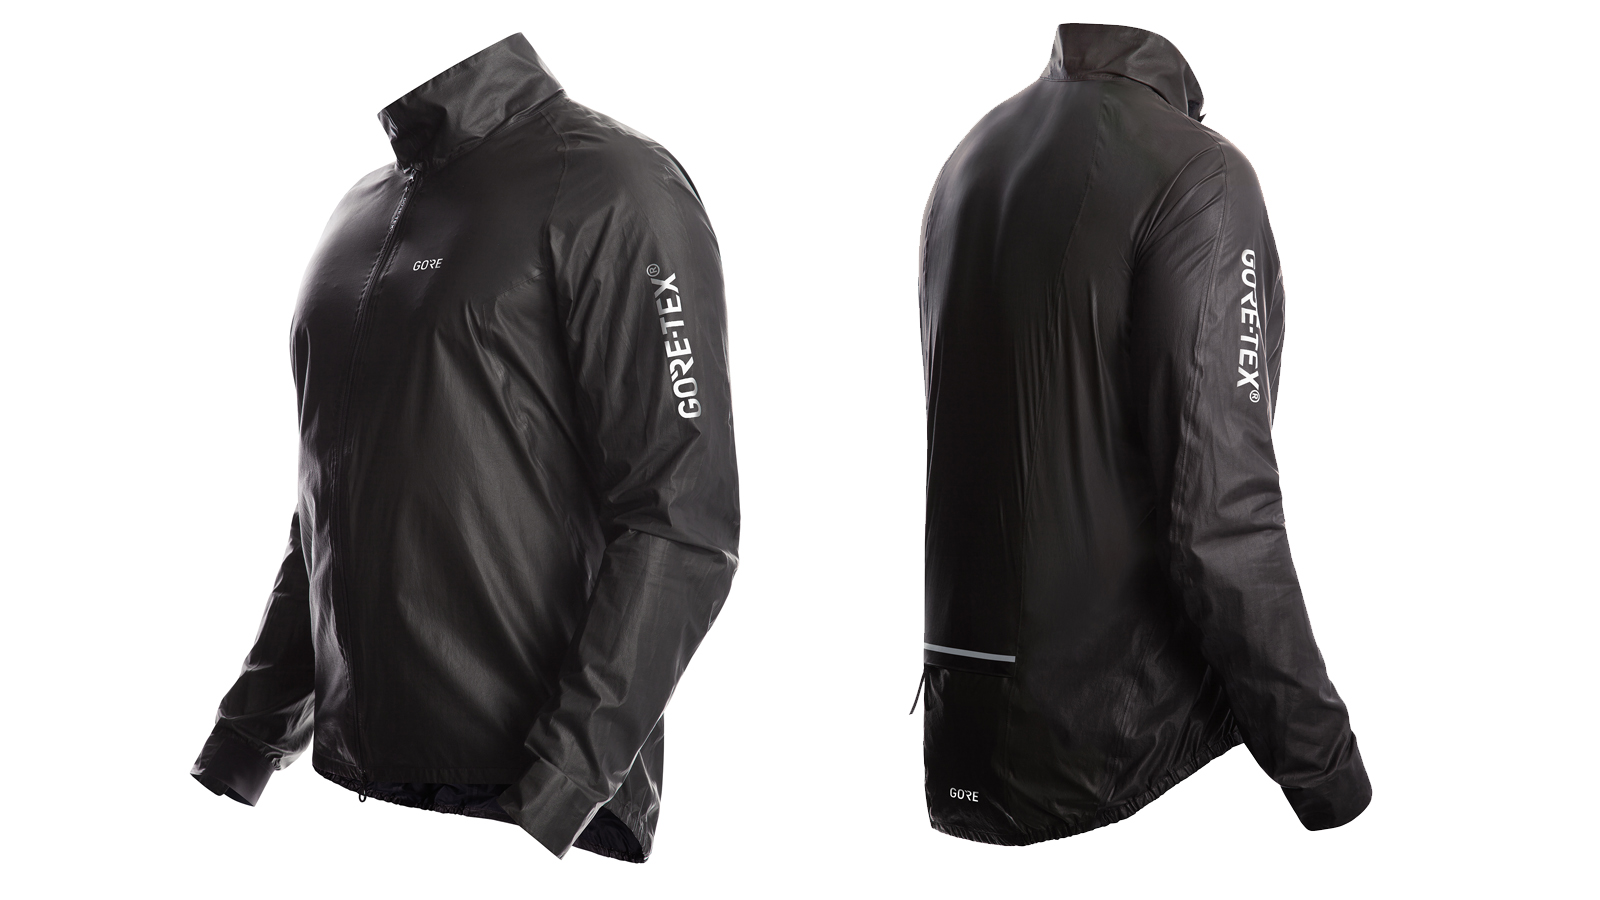 Waterproof cycling jacket: Gore